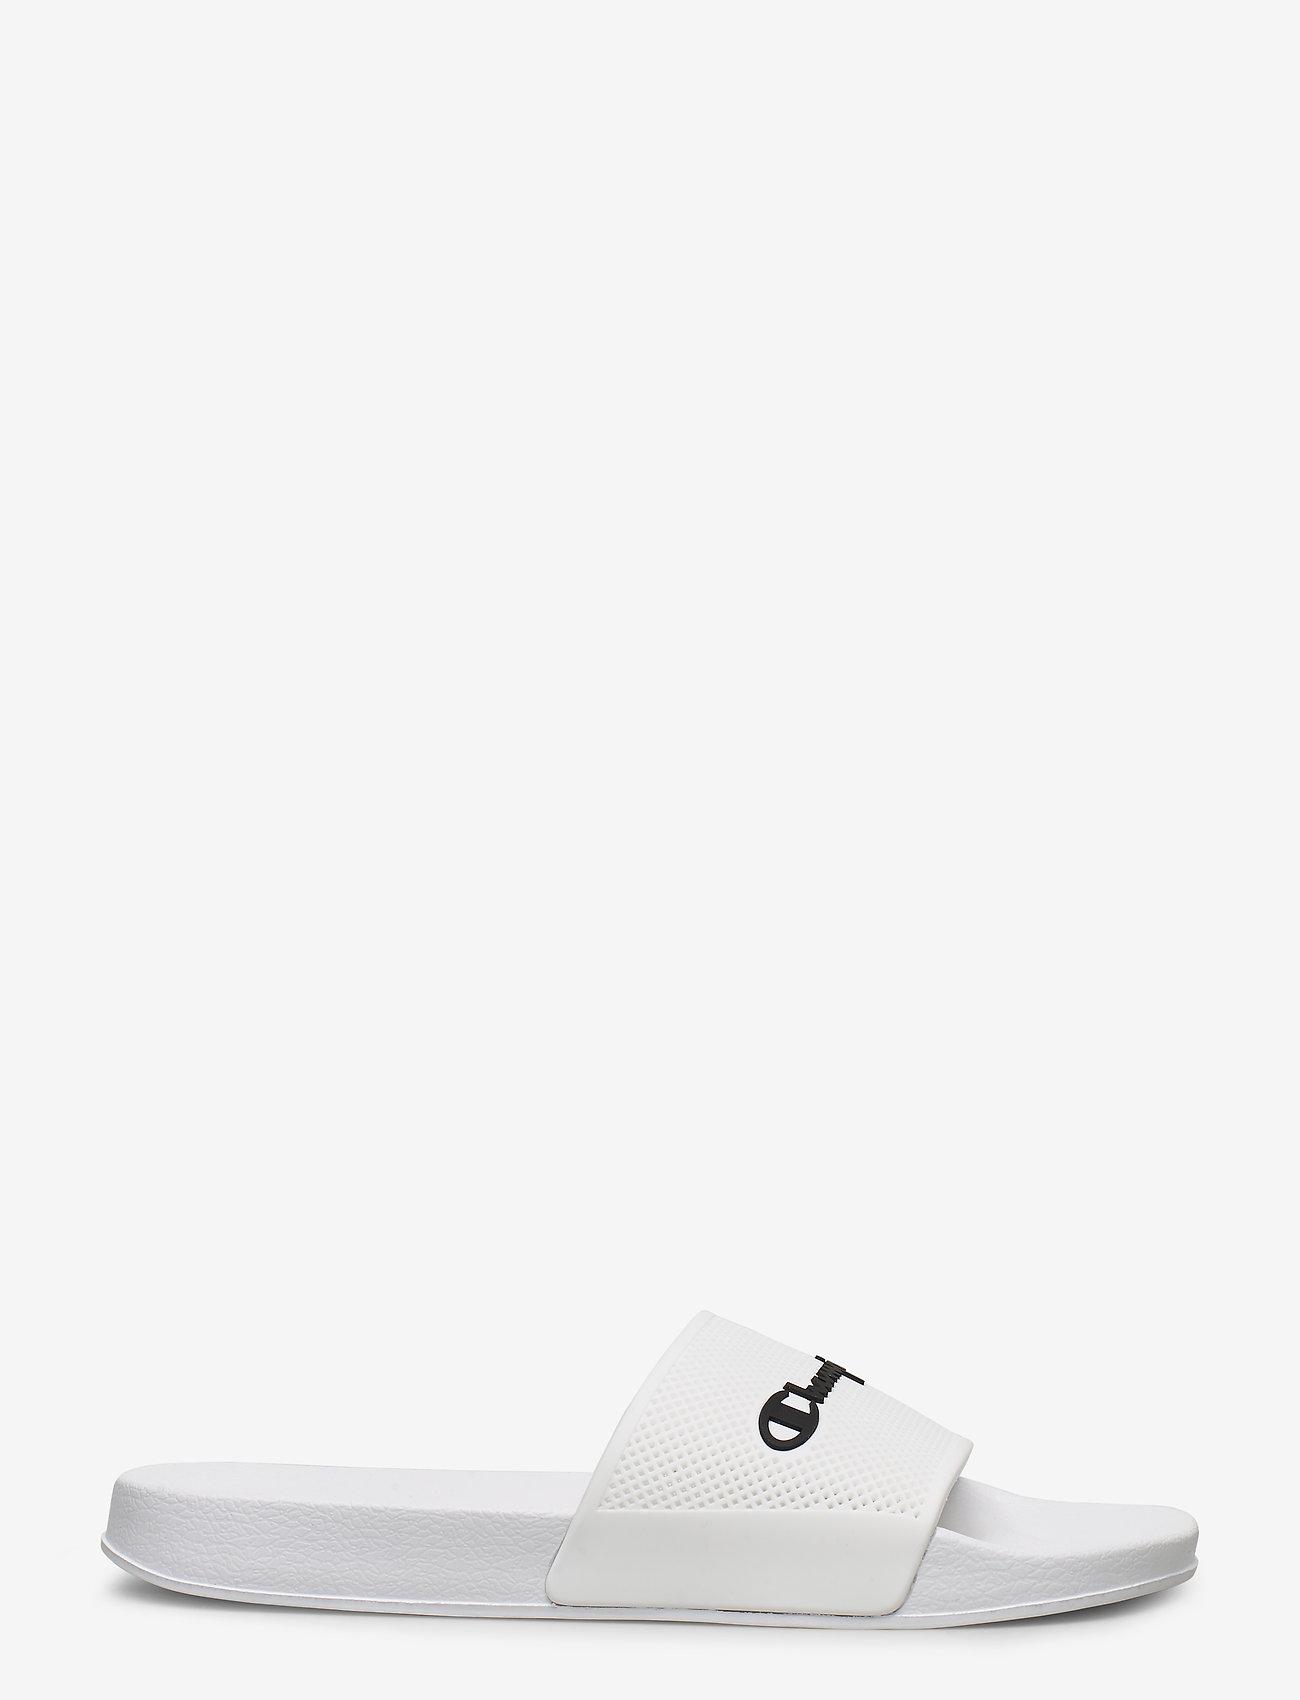 Champion - Sandal DAYTONA - pool sliders - white - 1